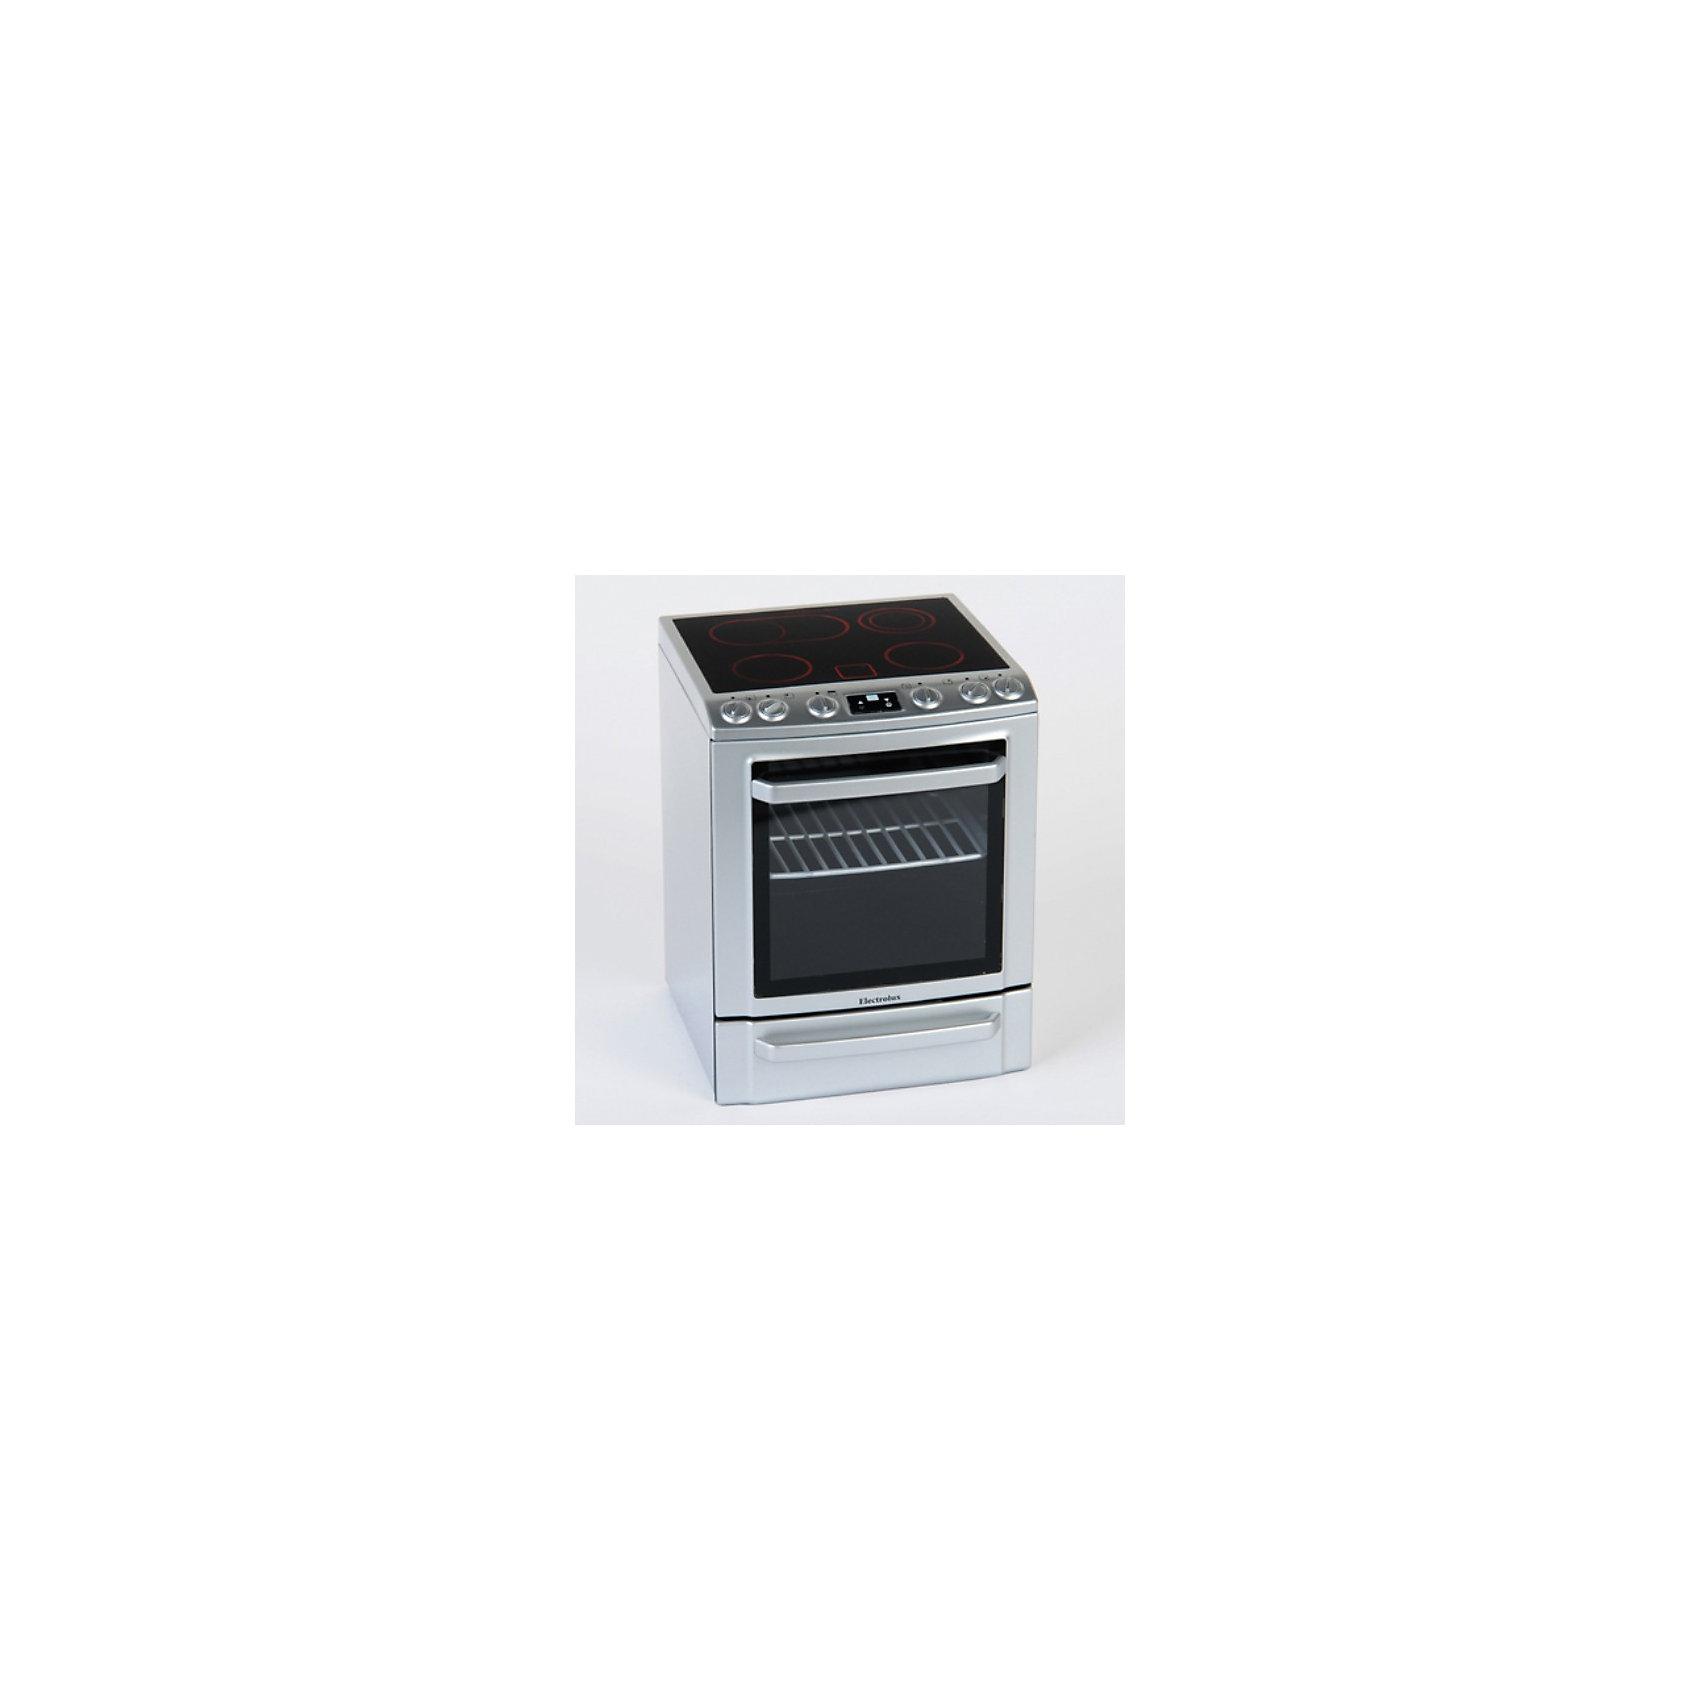 klein Плита со звуком и подсветкой Electrolux, Klein electrolux плита со звуком и подсветкой klein